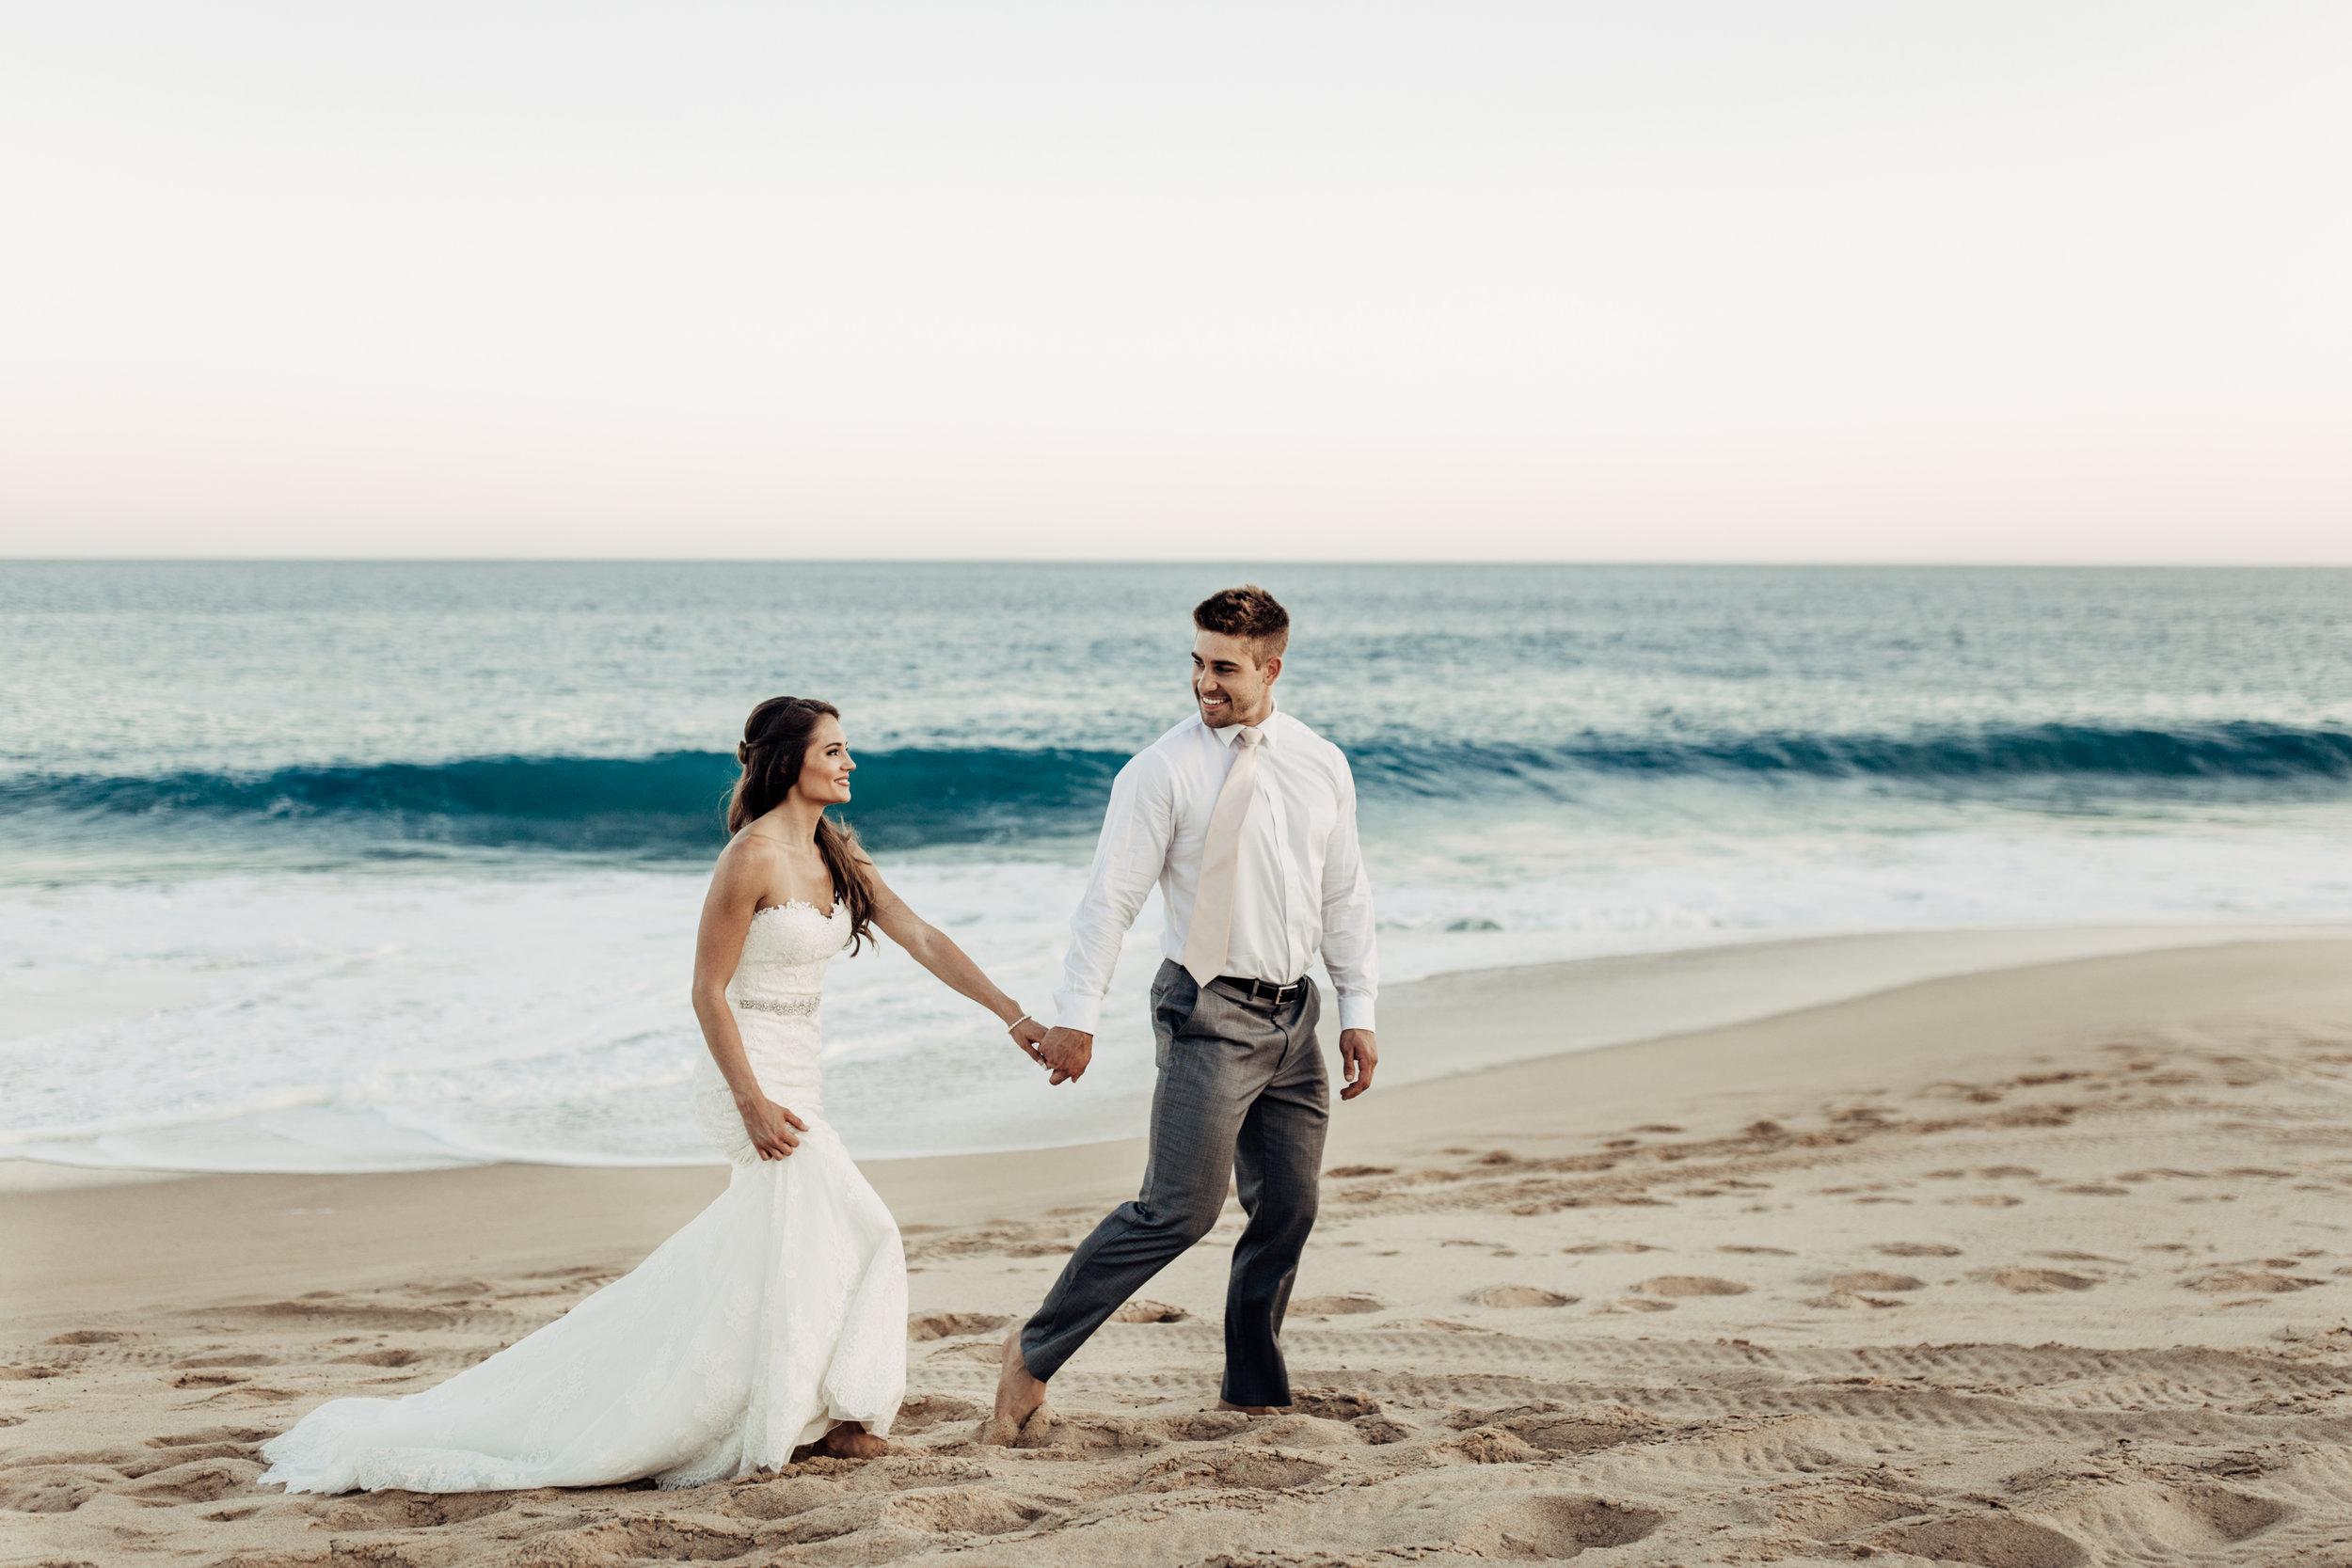 pueblo-bonito-sunset-beach-wedding-cabo-san-lucas500.jpg